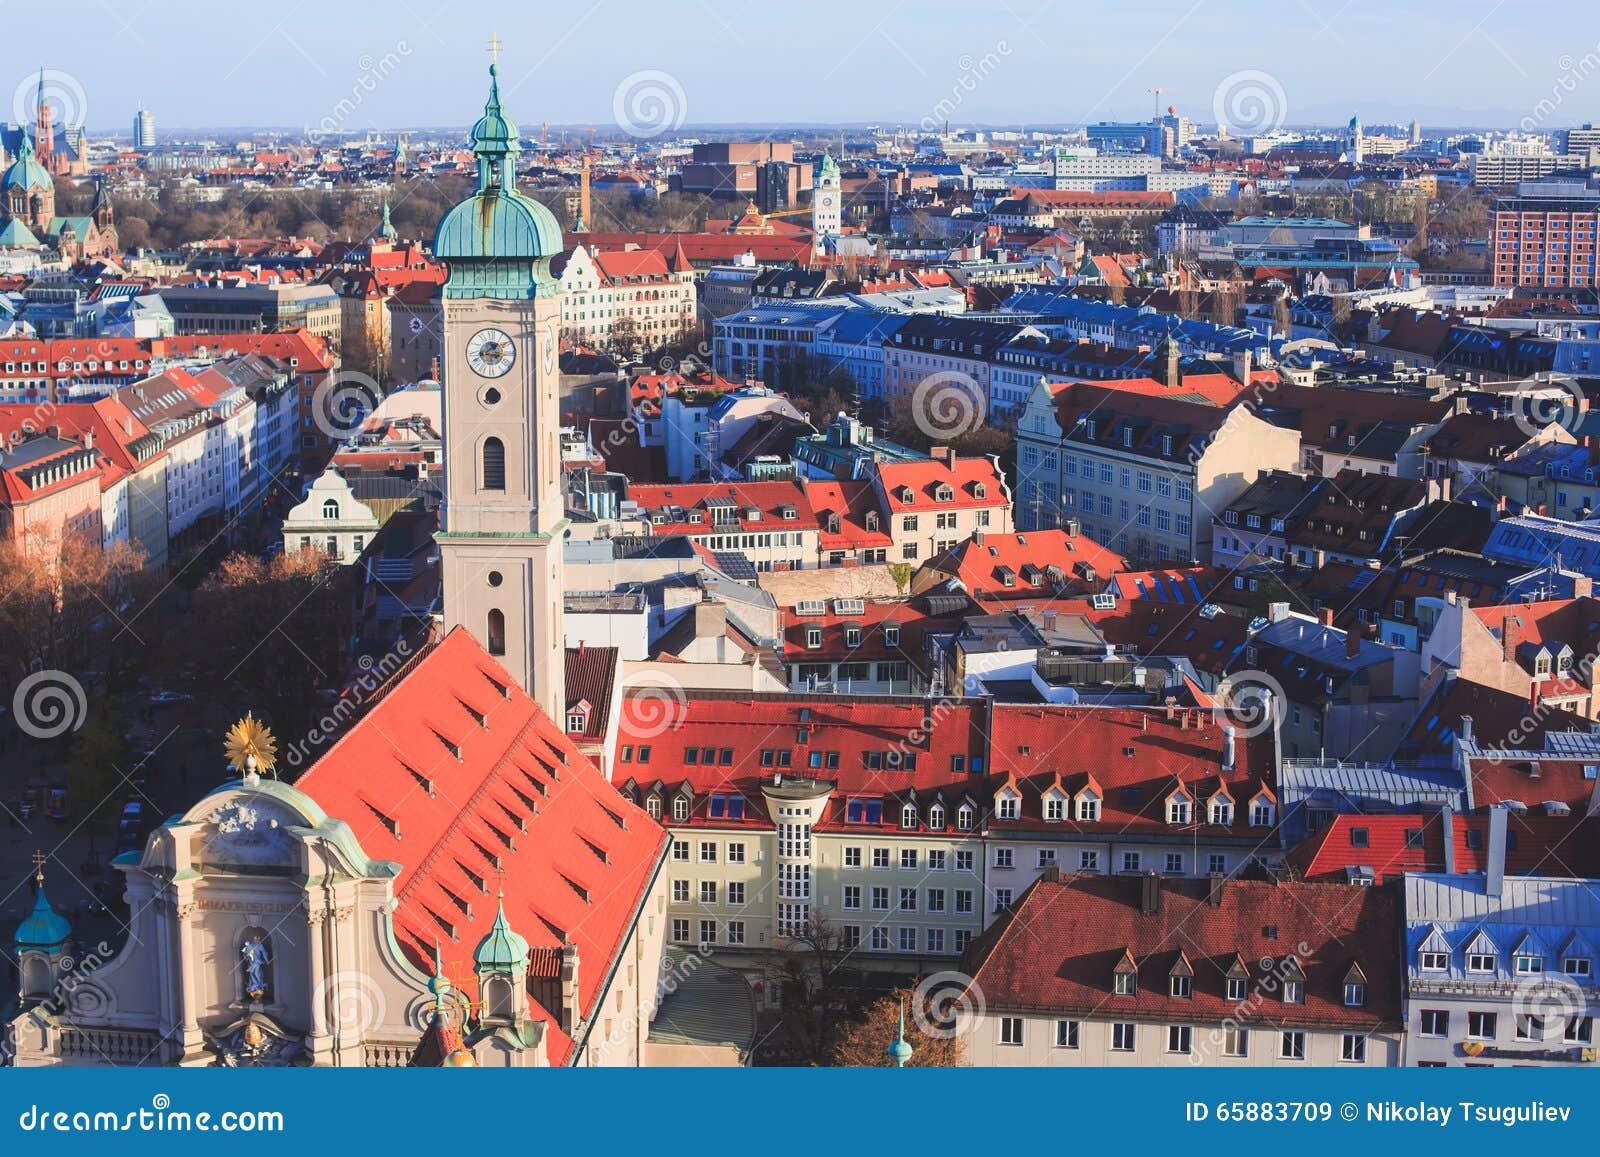 Bayern View